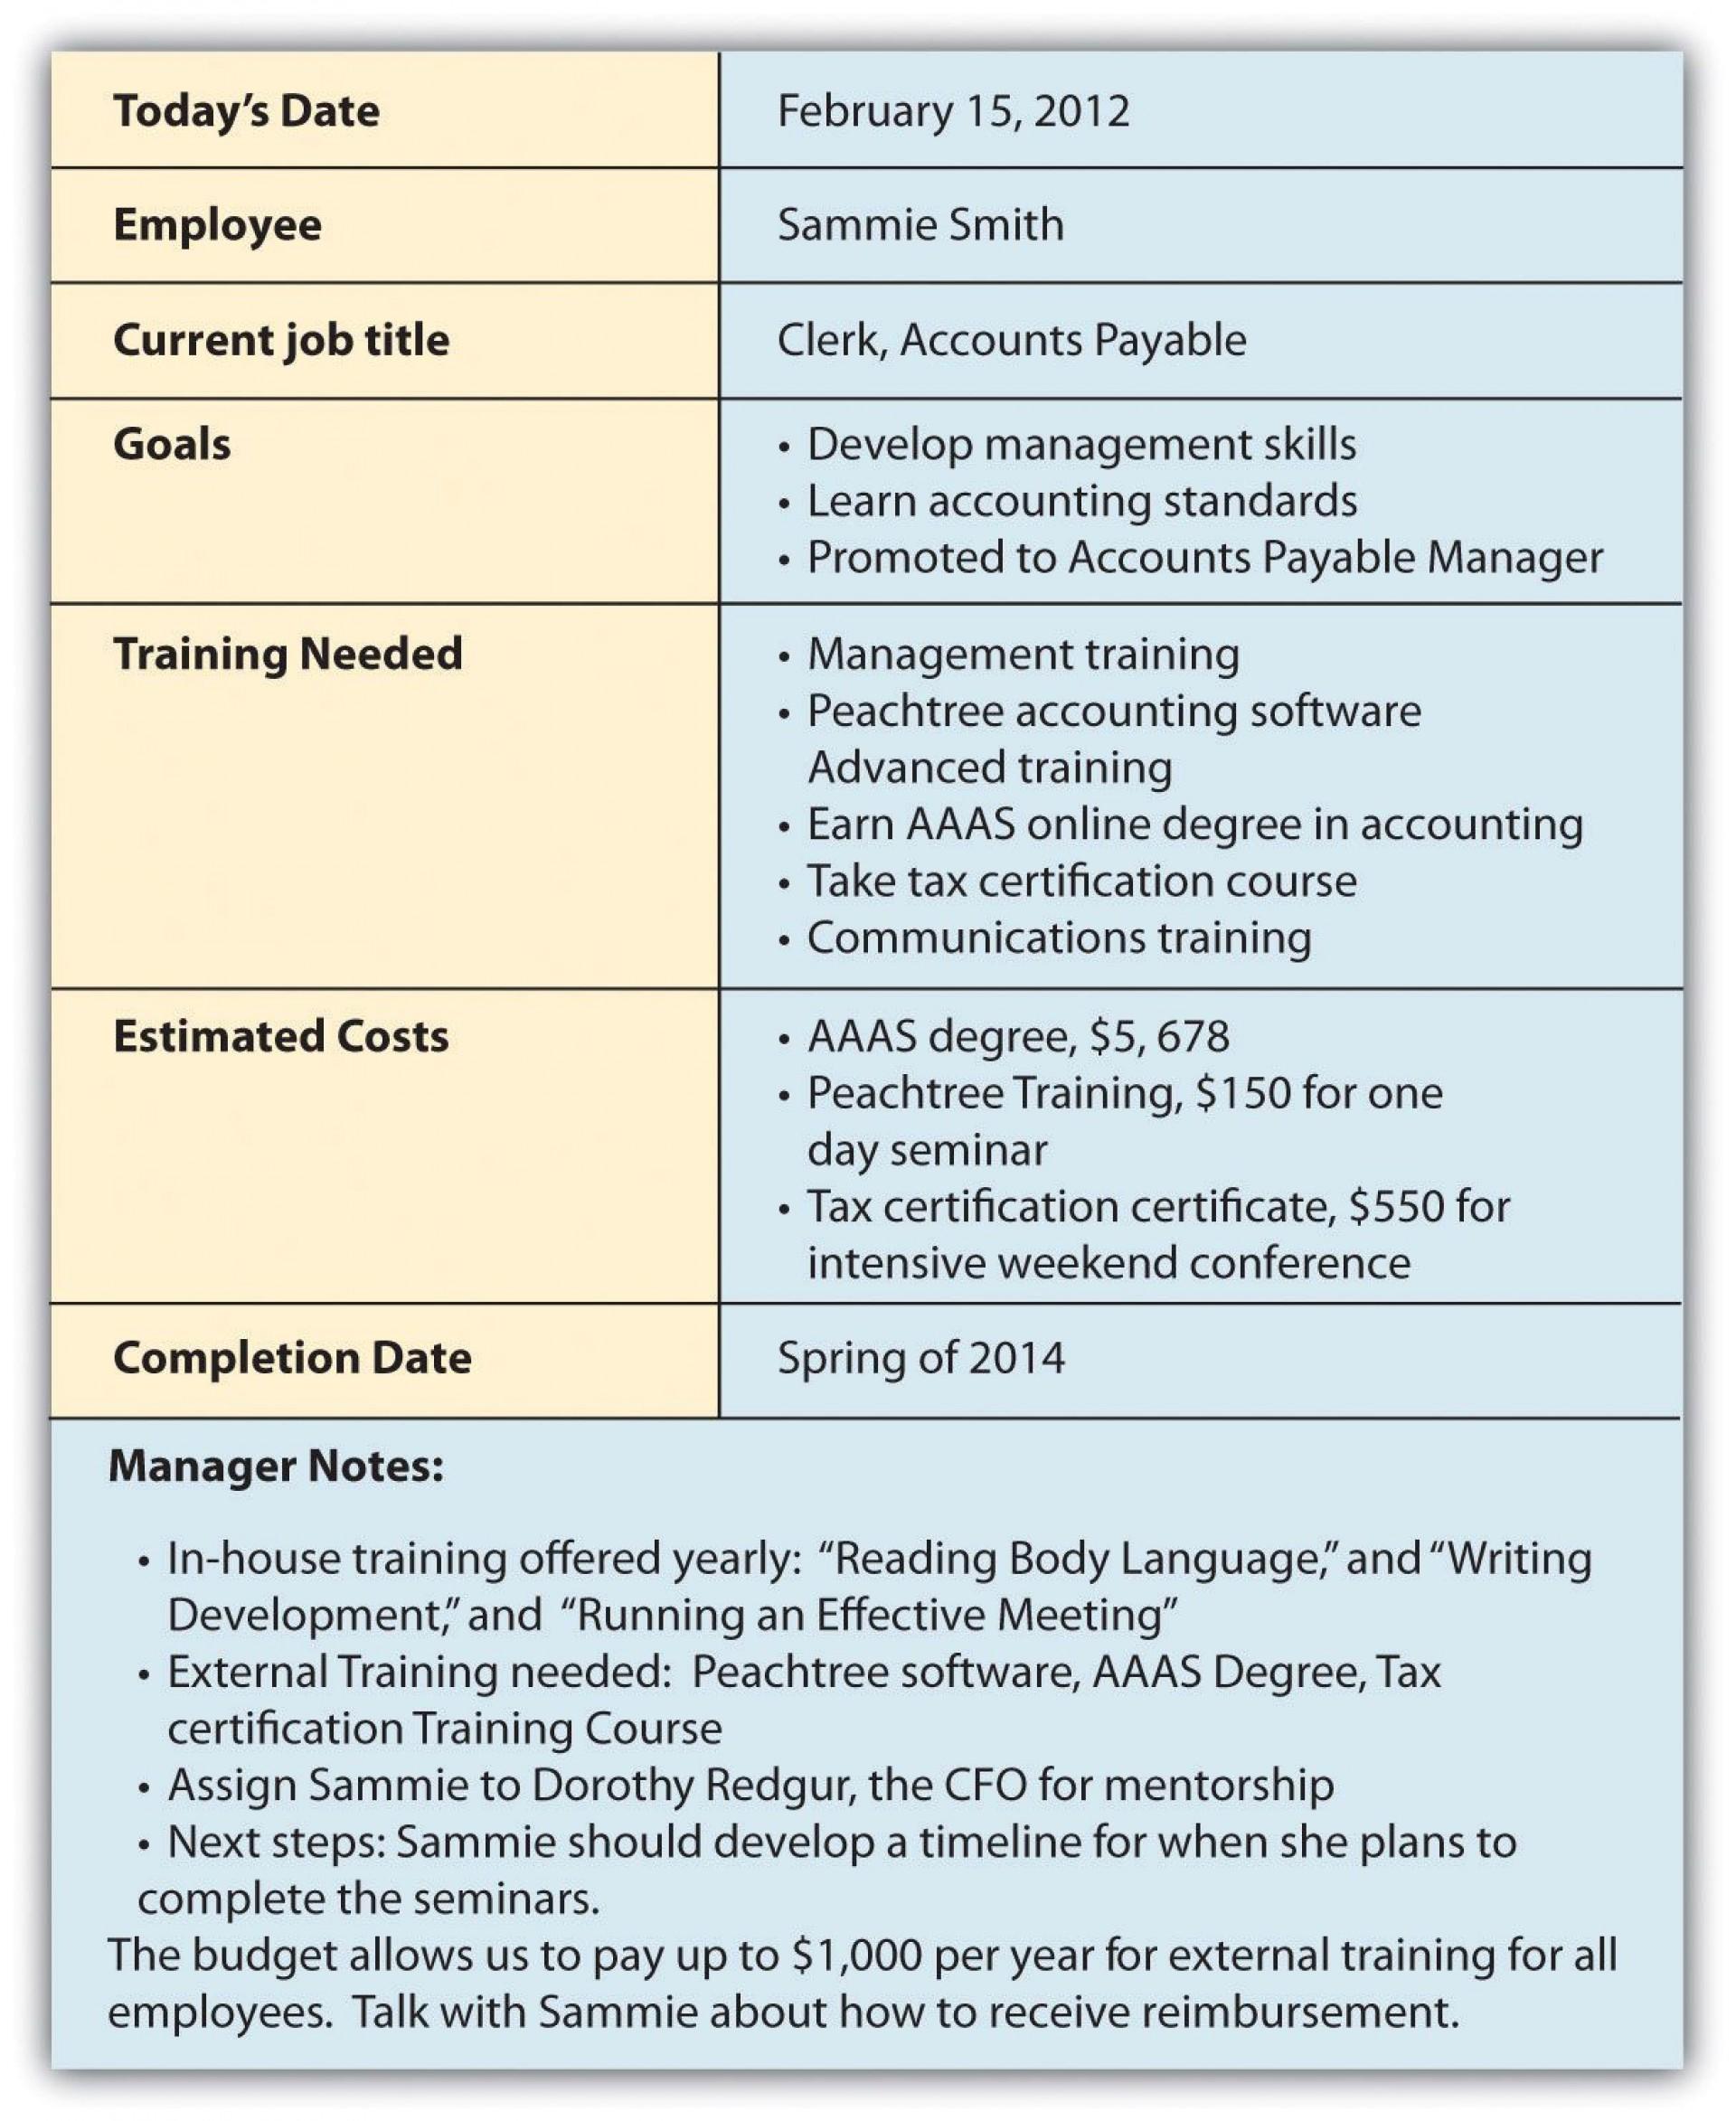 002 Wonderful Employee Development Plan Template Highest Clarity  Ppt Free1920